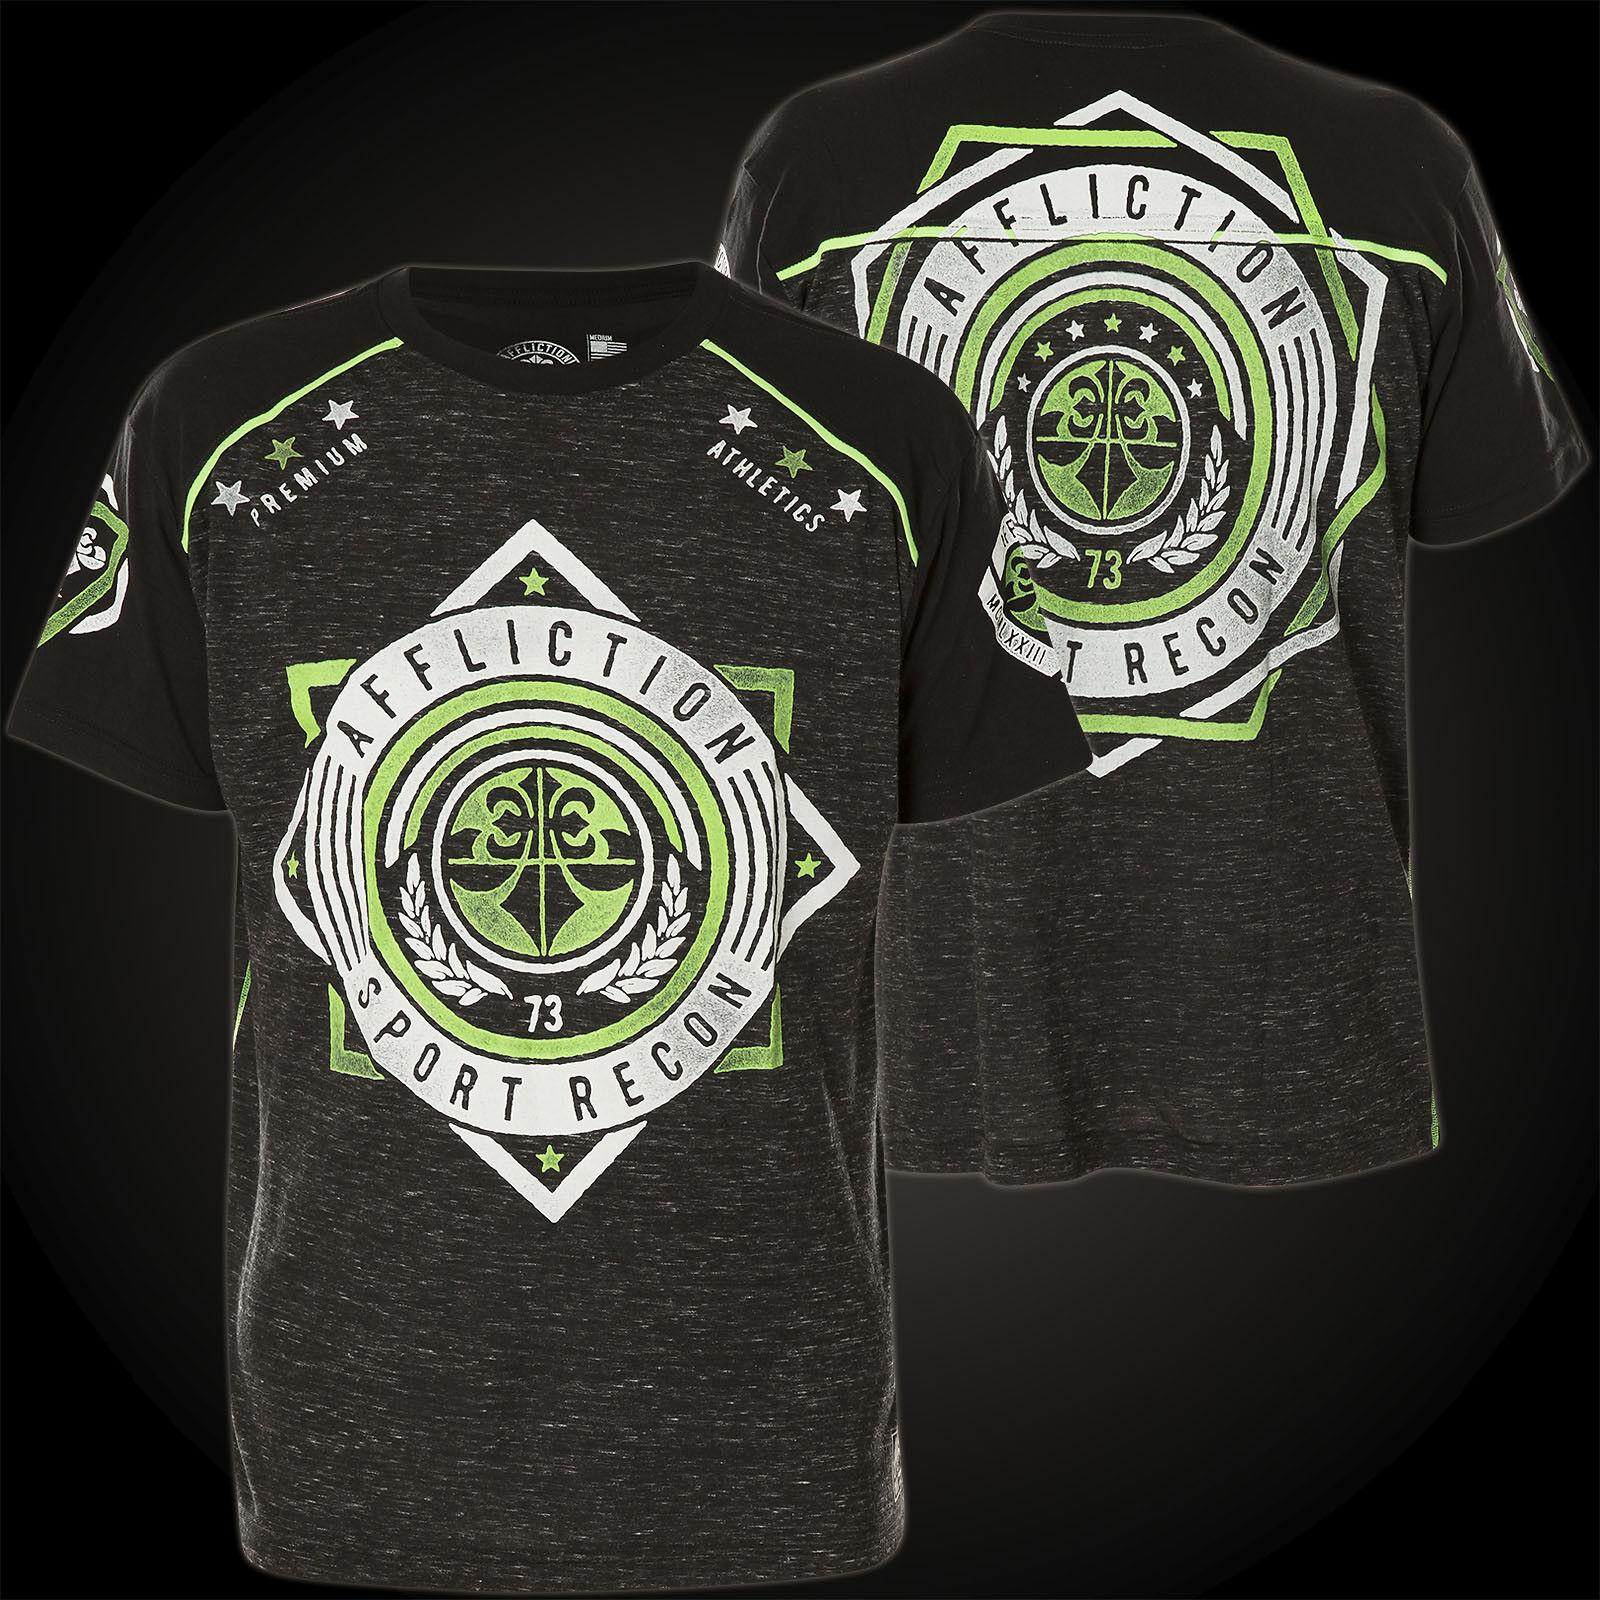 Affliction T-SHIRT SPORT 73 GRIGIO NERO T-shirts Uomo